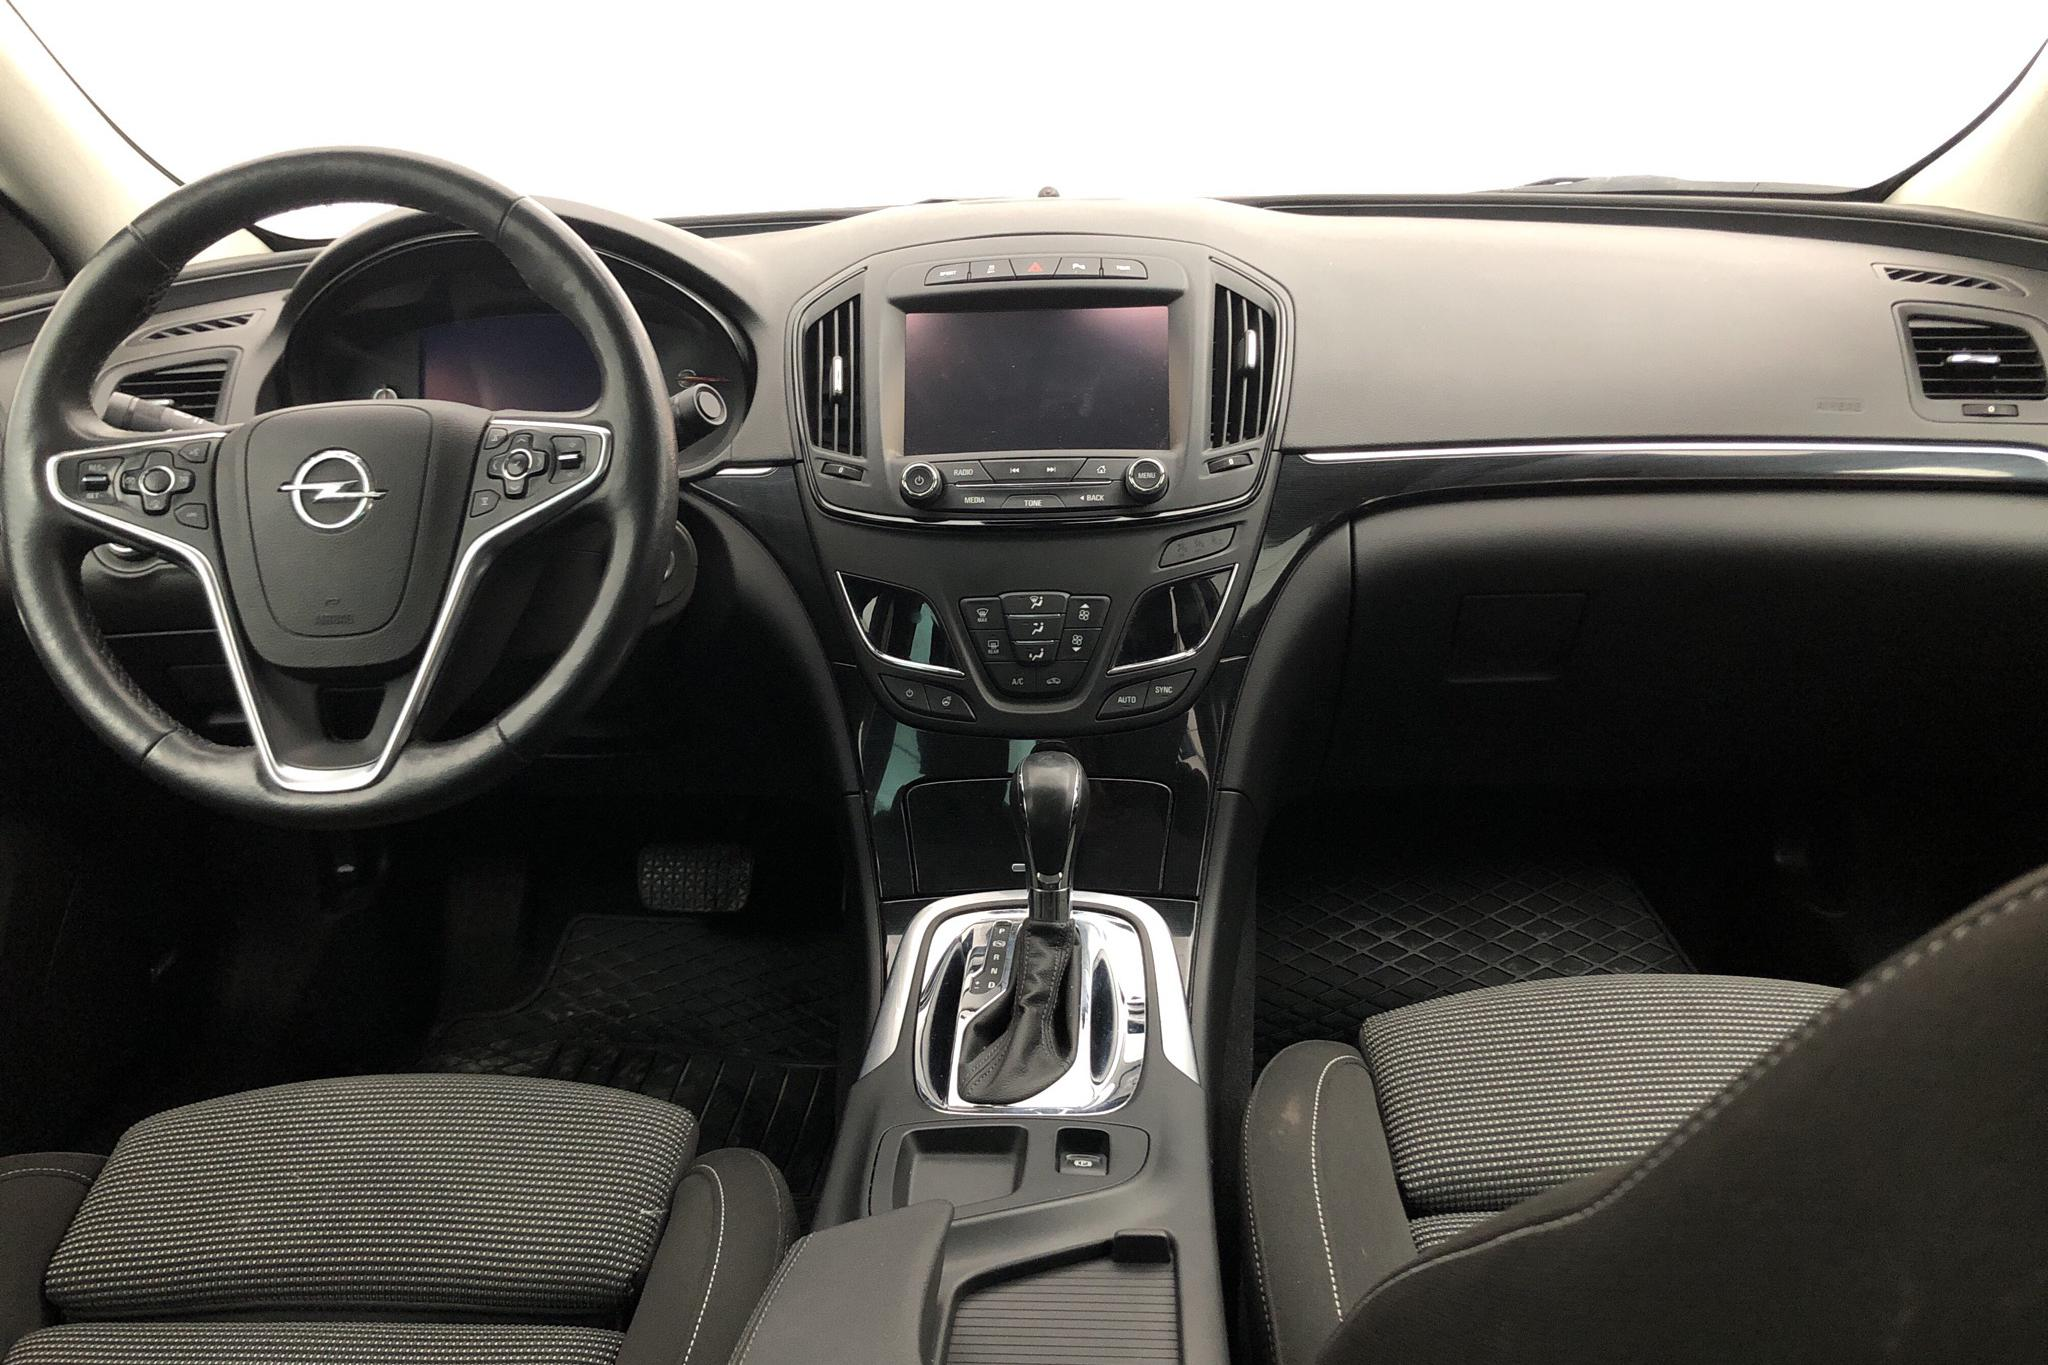 Opel Insignia 2.0 CDTI ECOTEC 4x4 5dr (170hk) - 62 950 km - Automatic - red - 2016